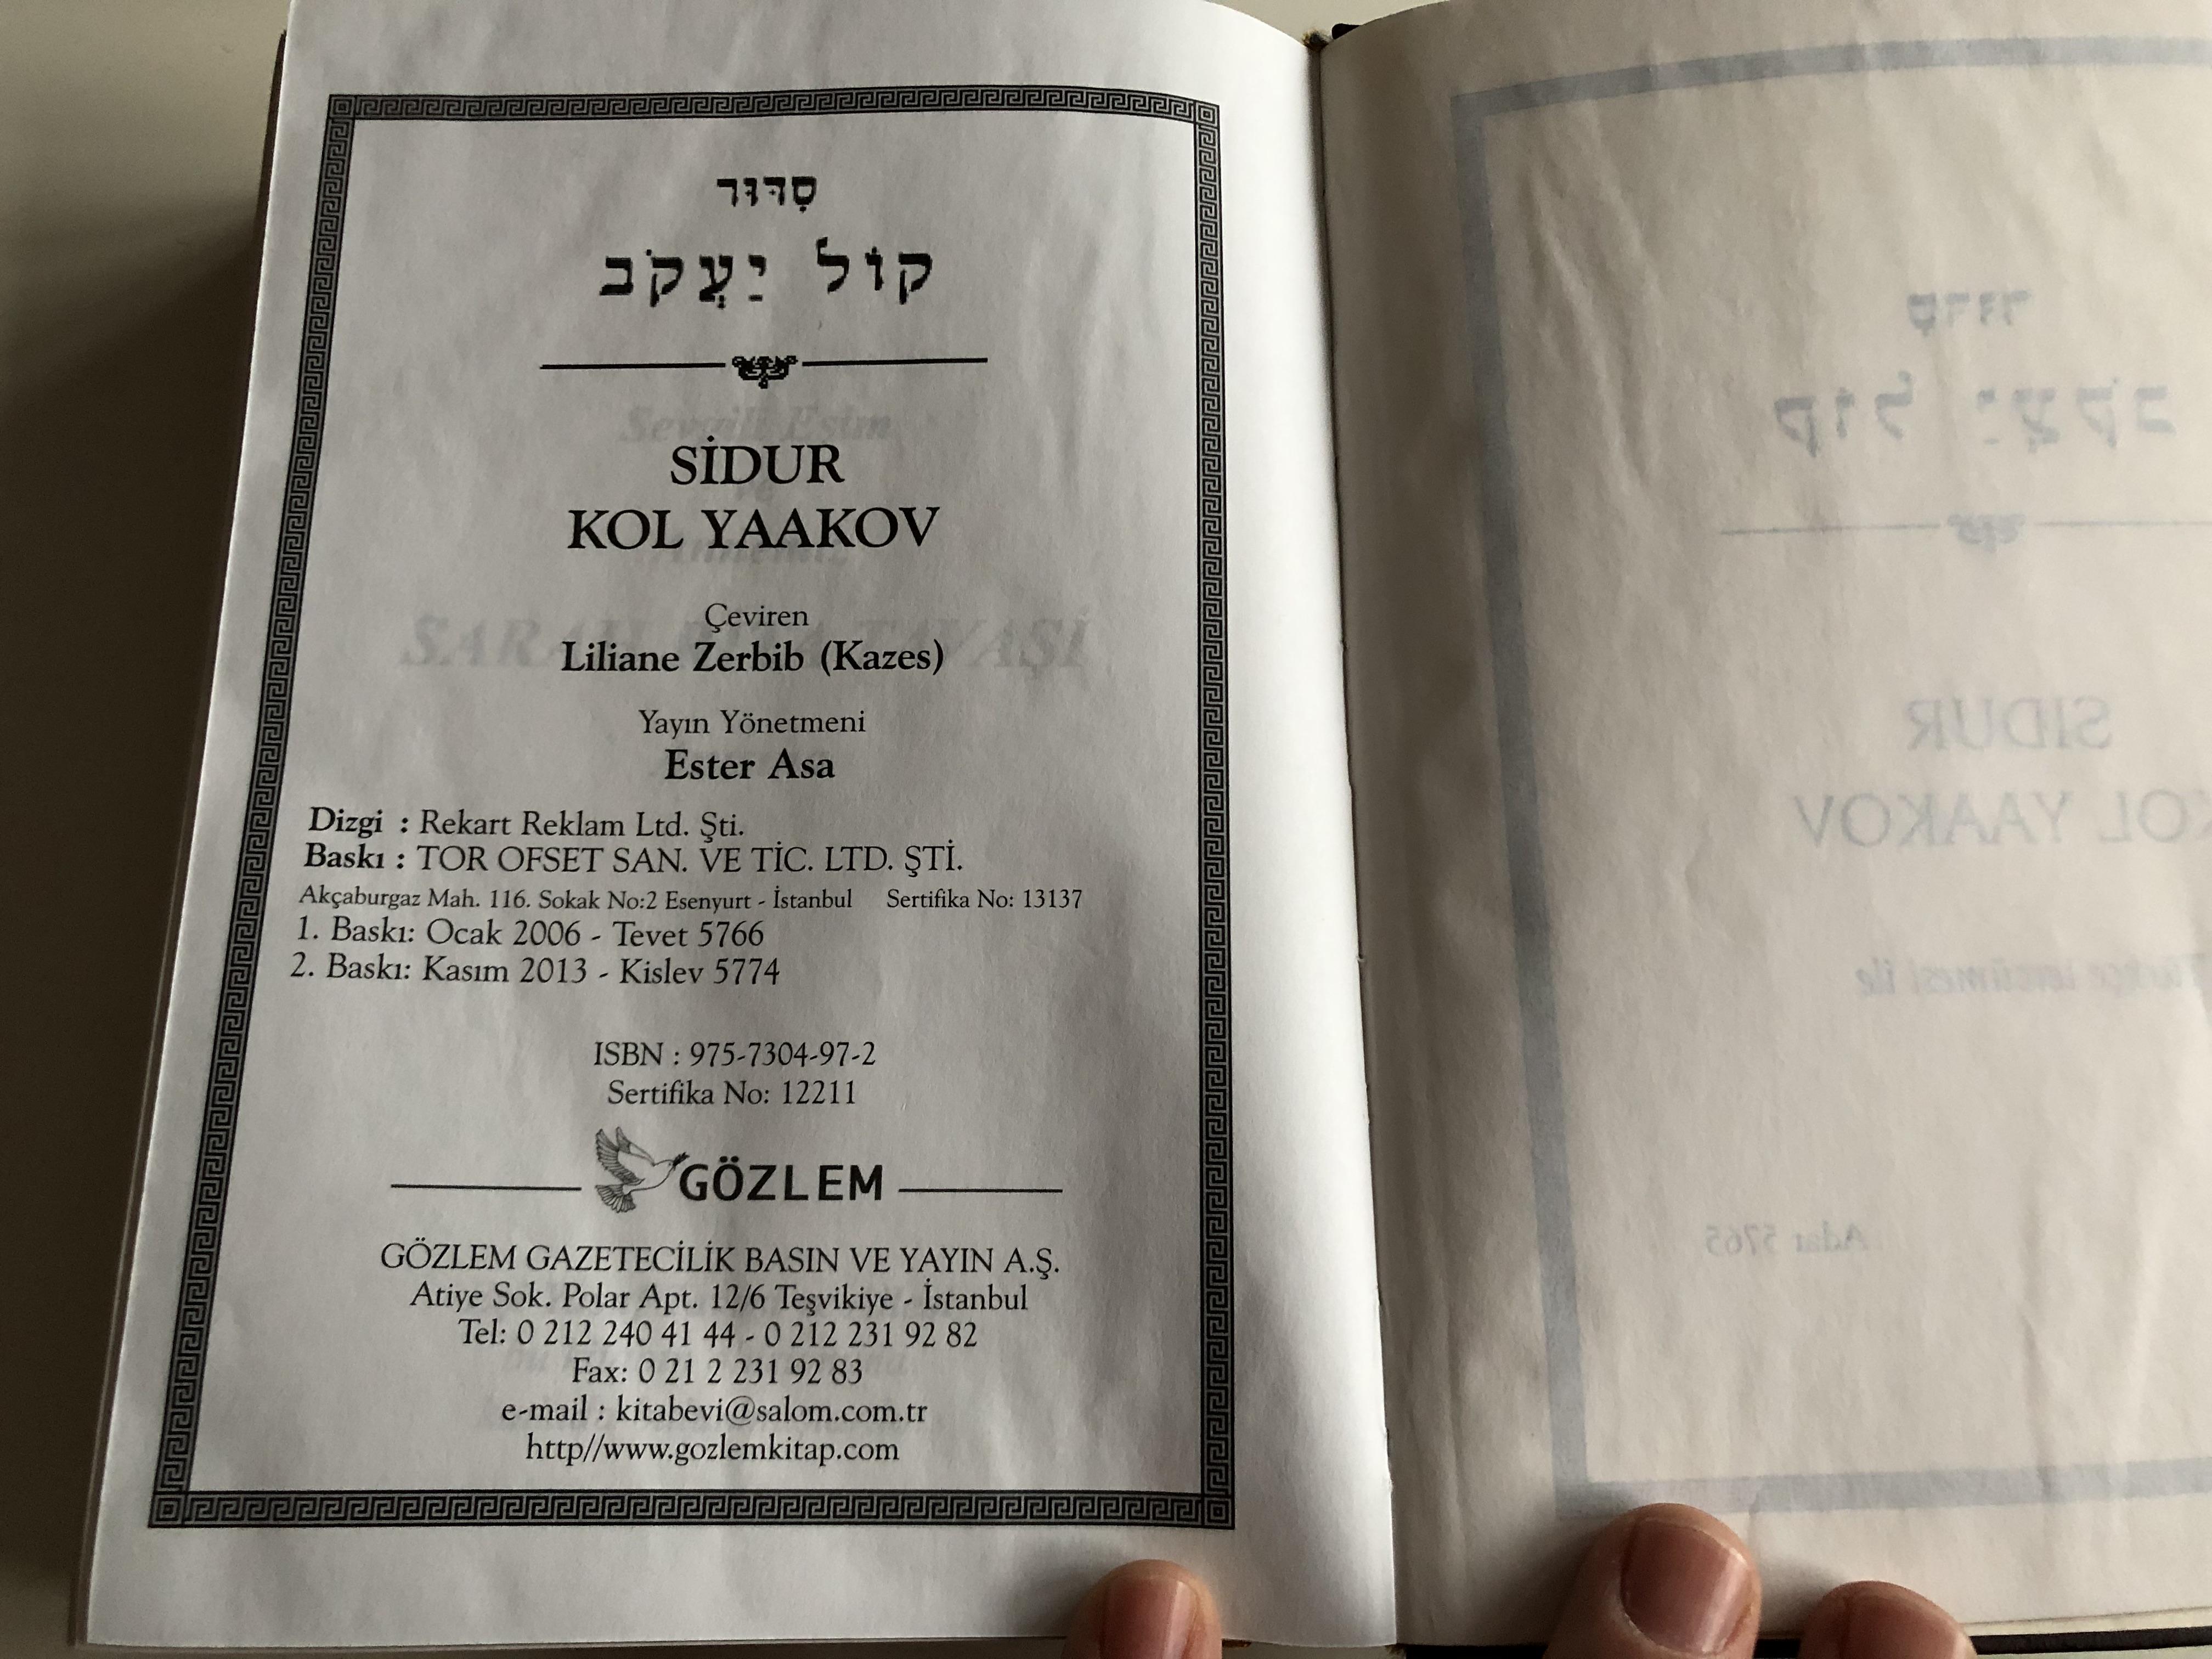 sidur-kol-yaakov-hebrew-turkish-bilingual-prayer-book-lilane-zerbib-kazes-golden-edges-hardcover-2013-6-.jpg